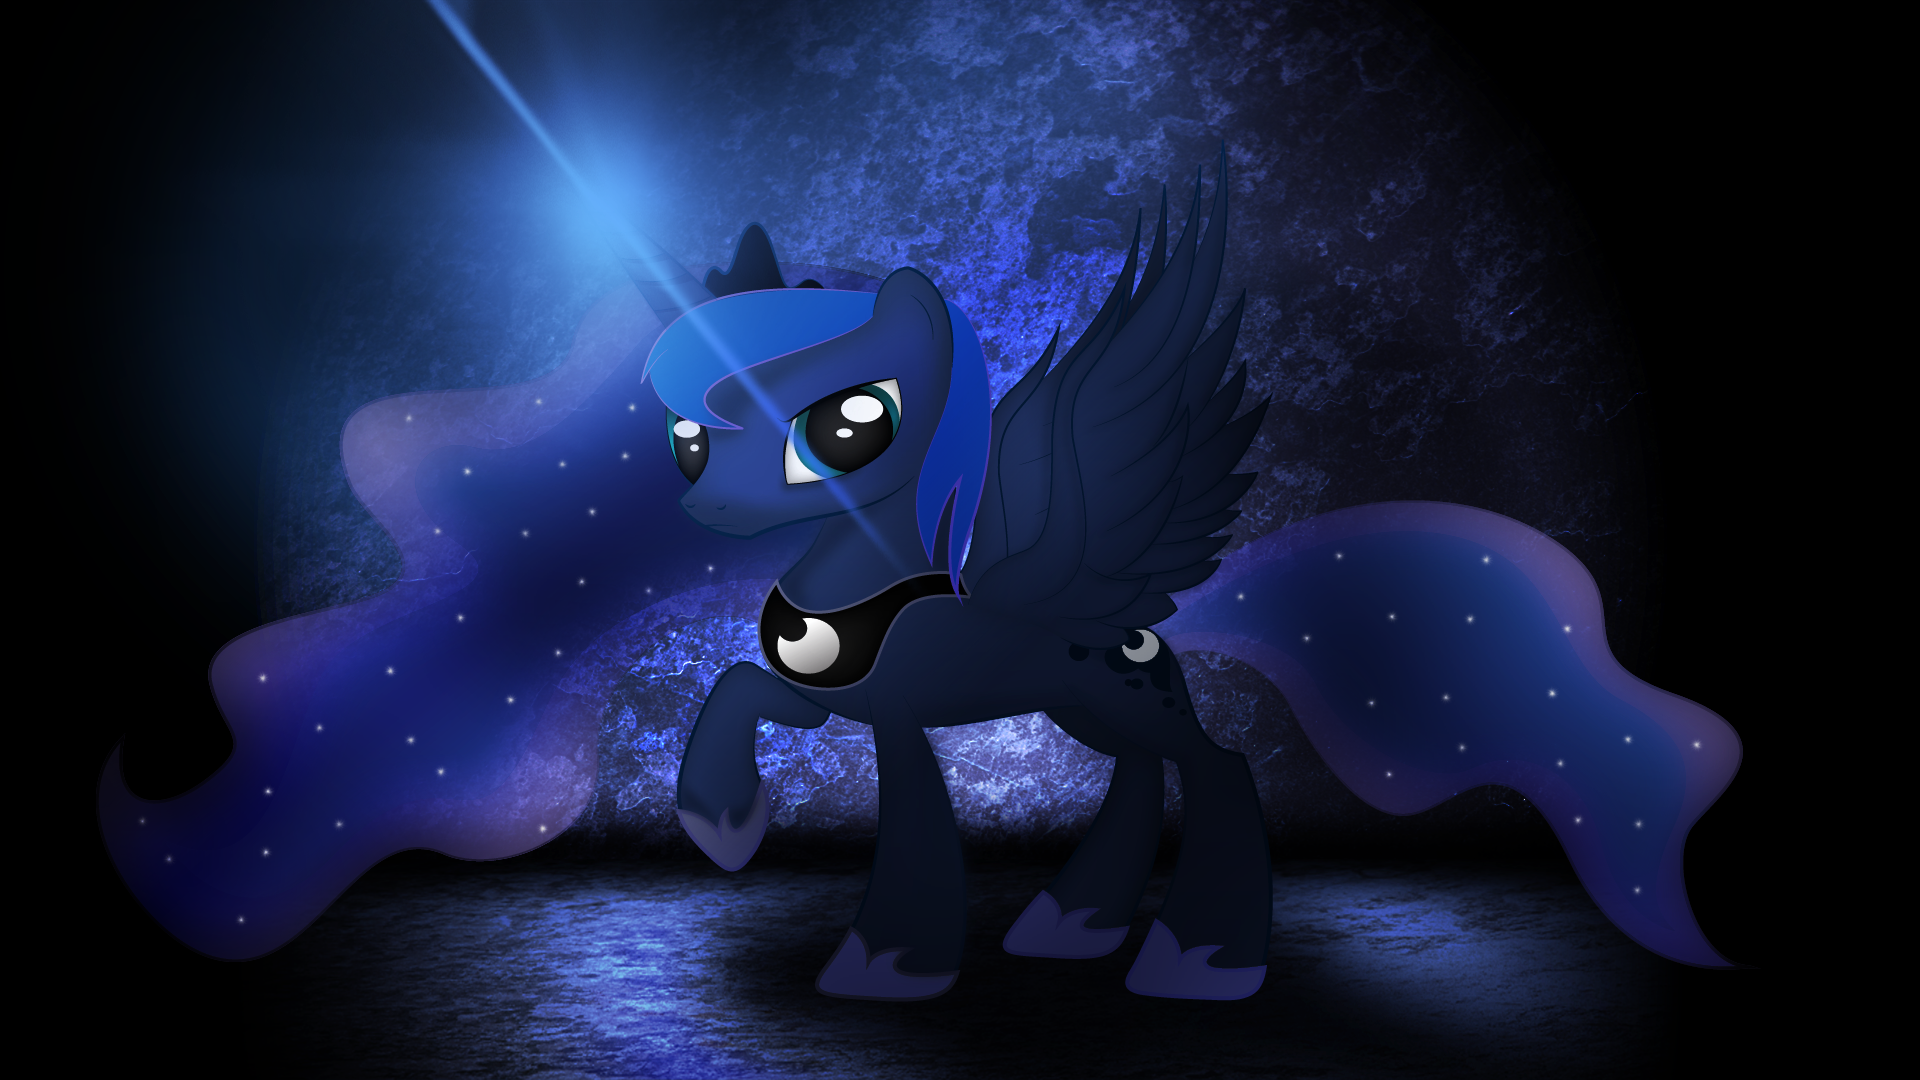 Princess Luna by Izeer